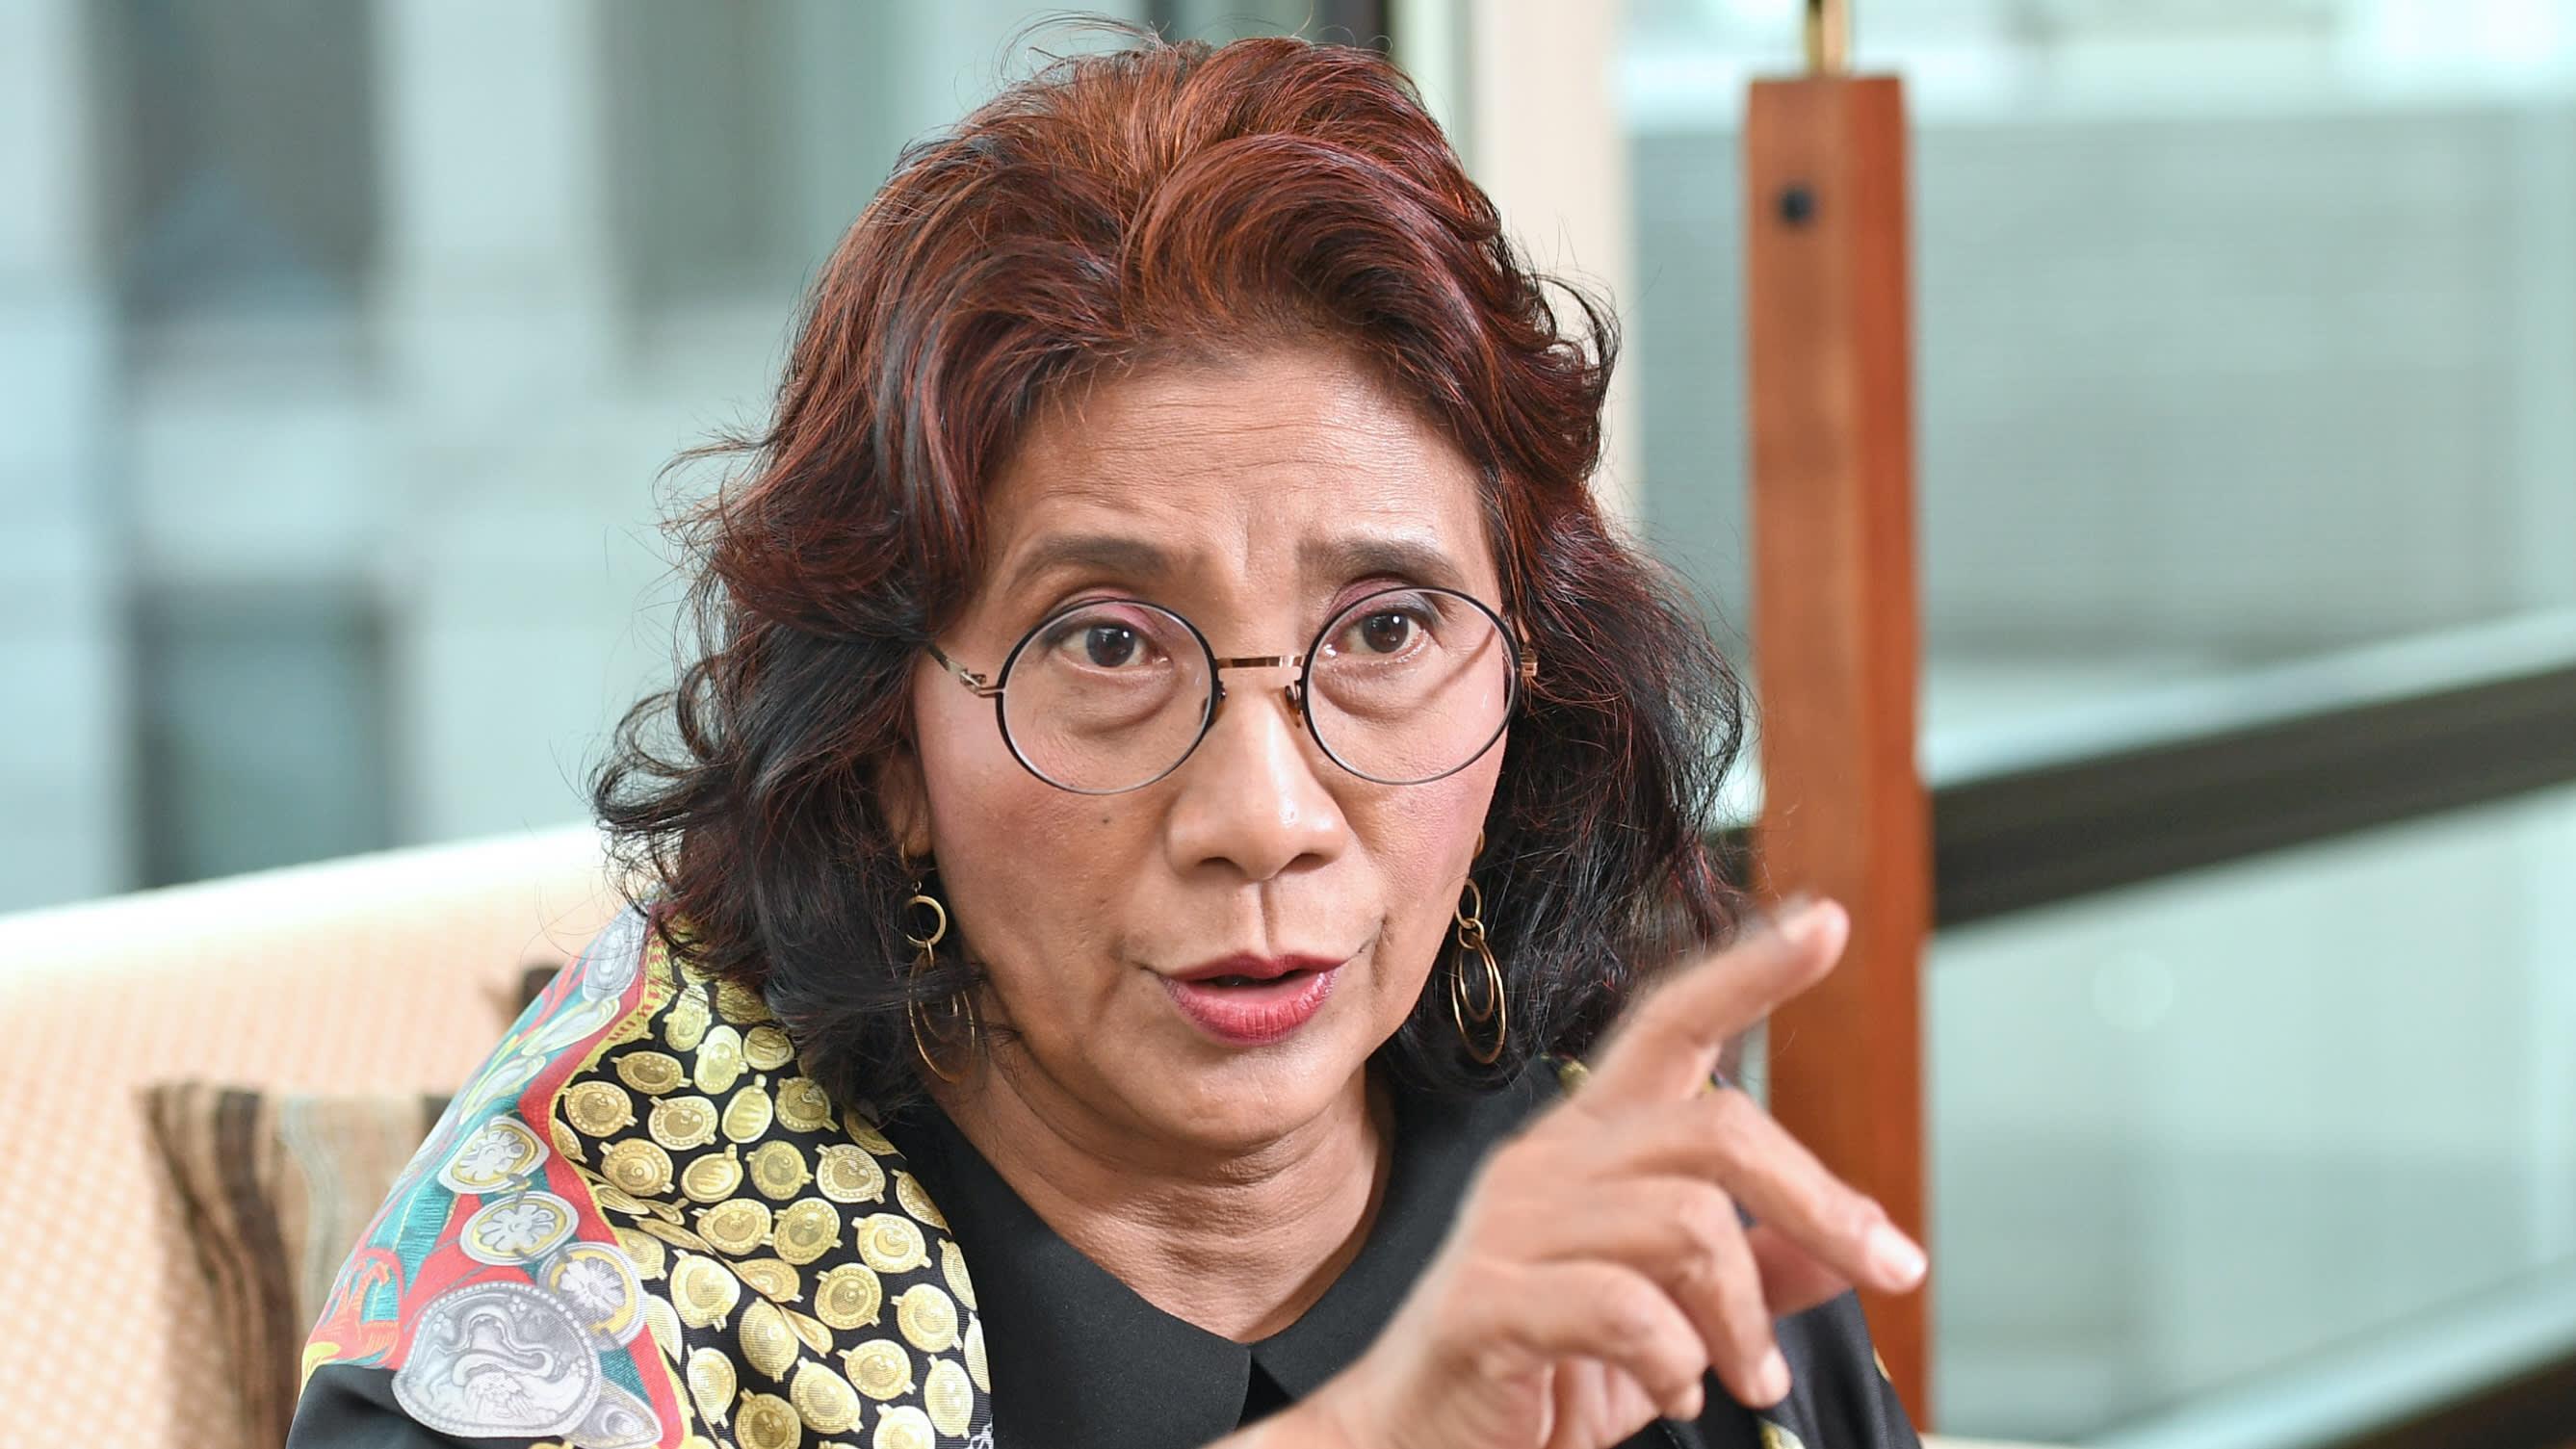 Semprot Sandi, Menteri Susi: Jangan Asal Ngomong, Baca Dulu Baru Bicara